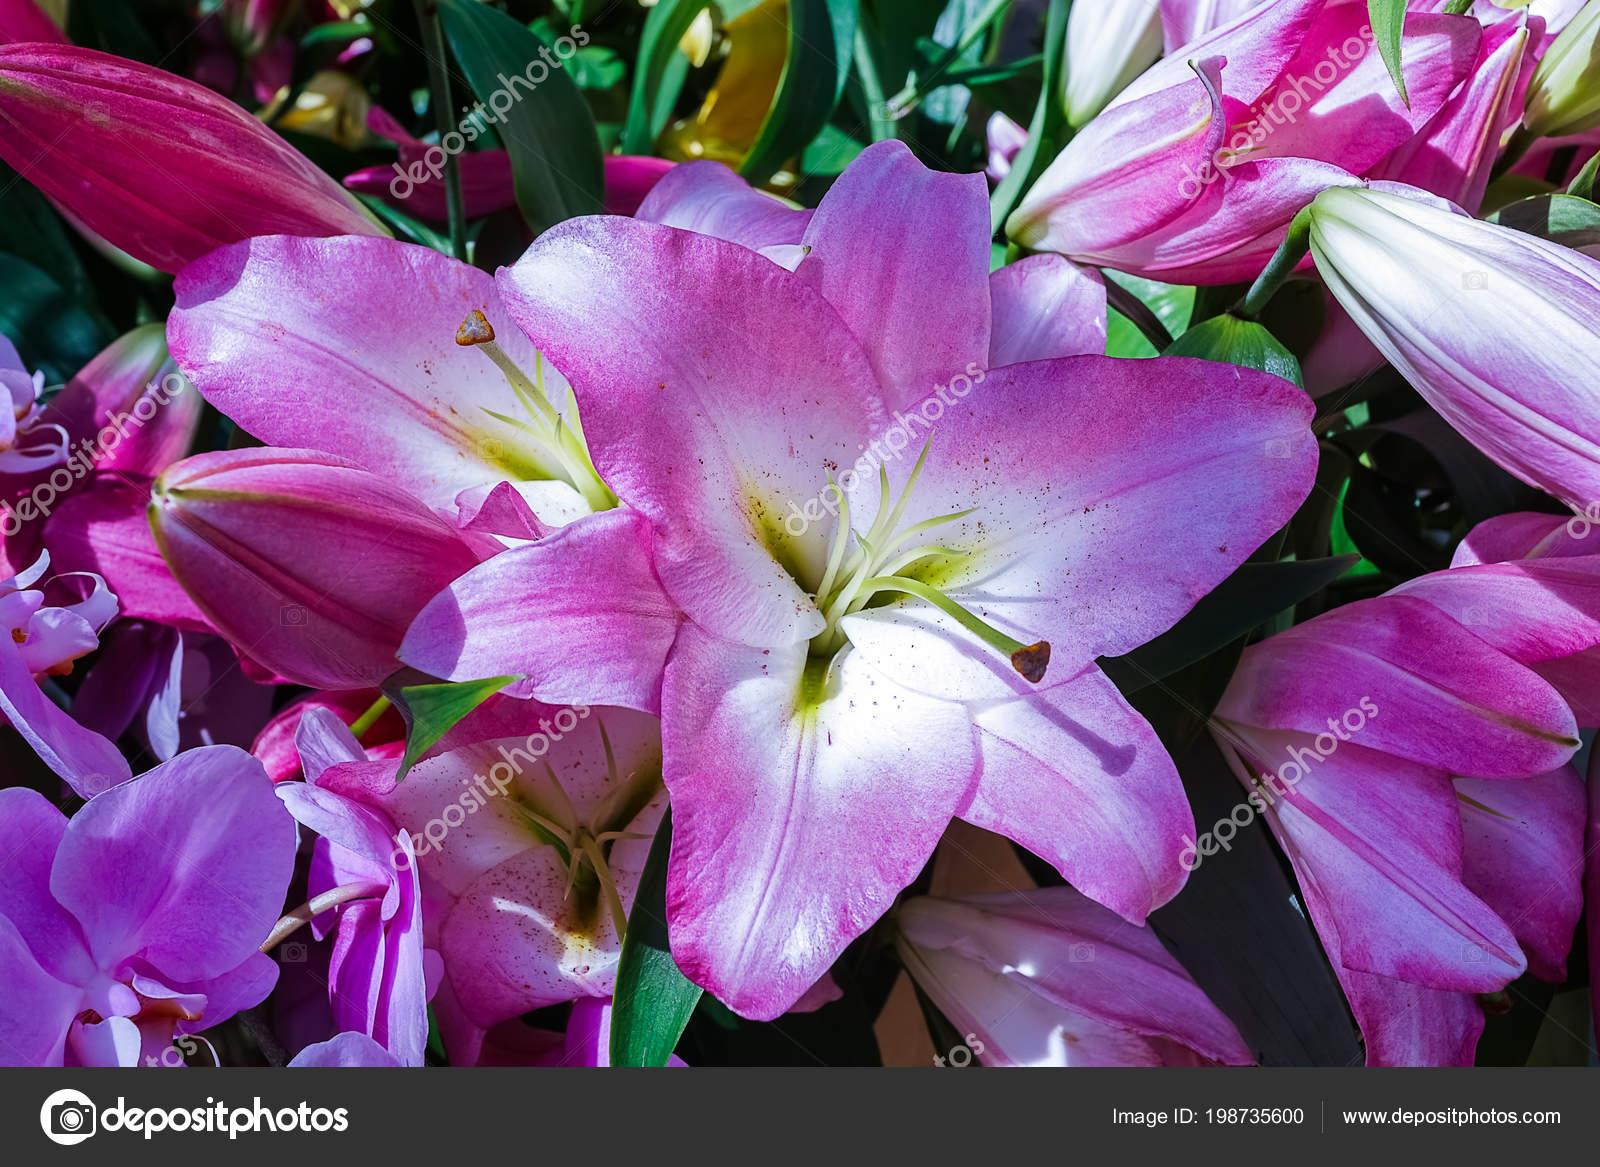 Purple lily flowers antural light stock photo larisaur purple lily flowers antural light stock photo izmirmasajfo